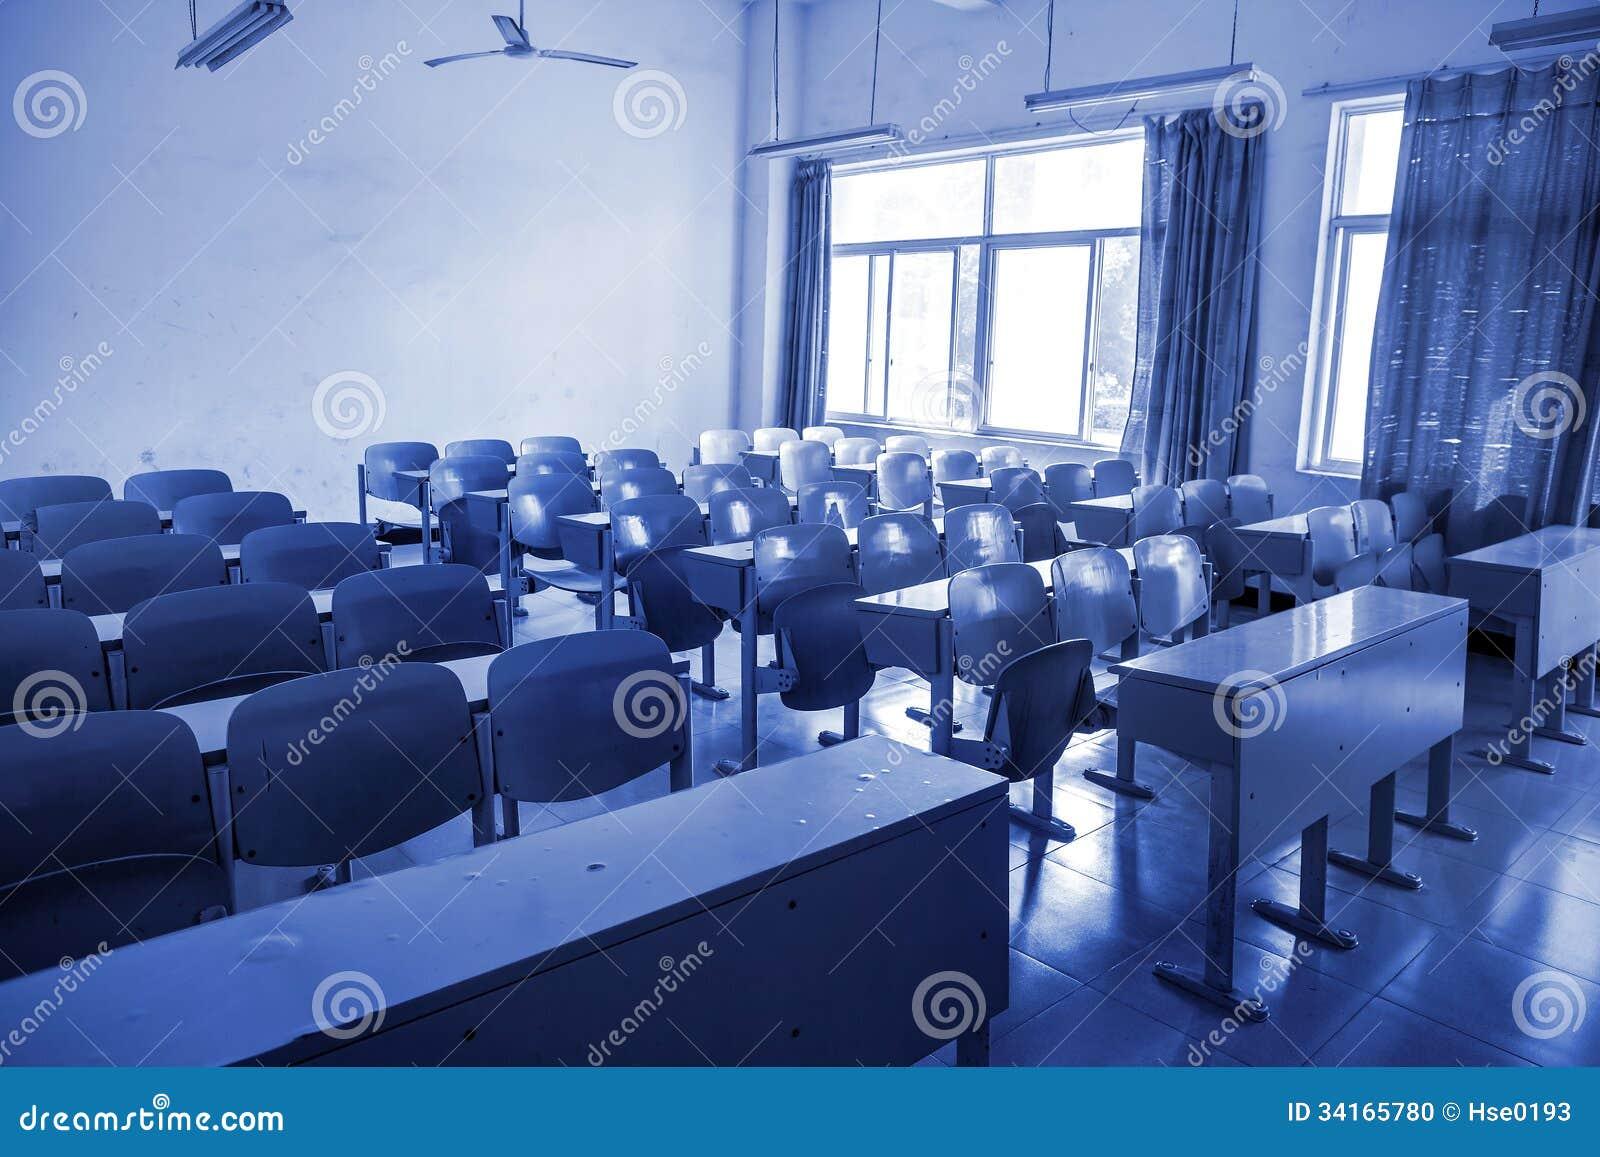 neat rows of school desks in classroom with blue tones